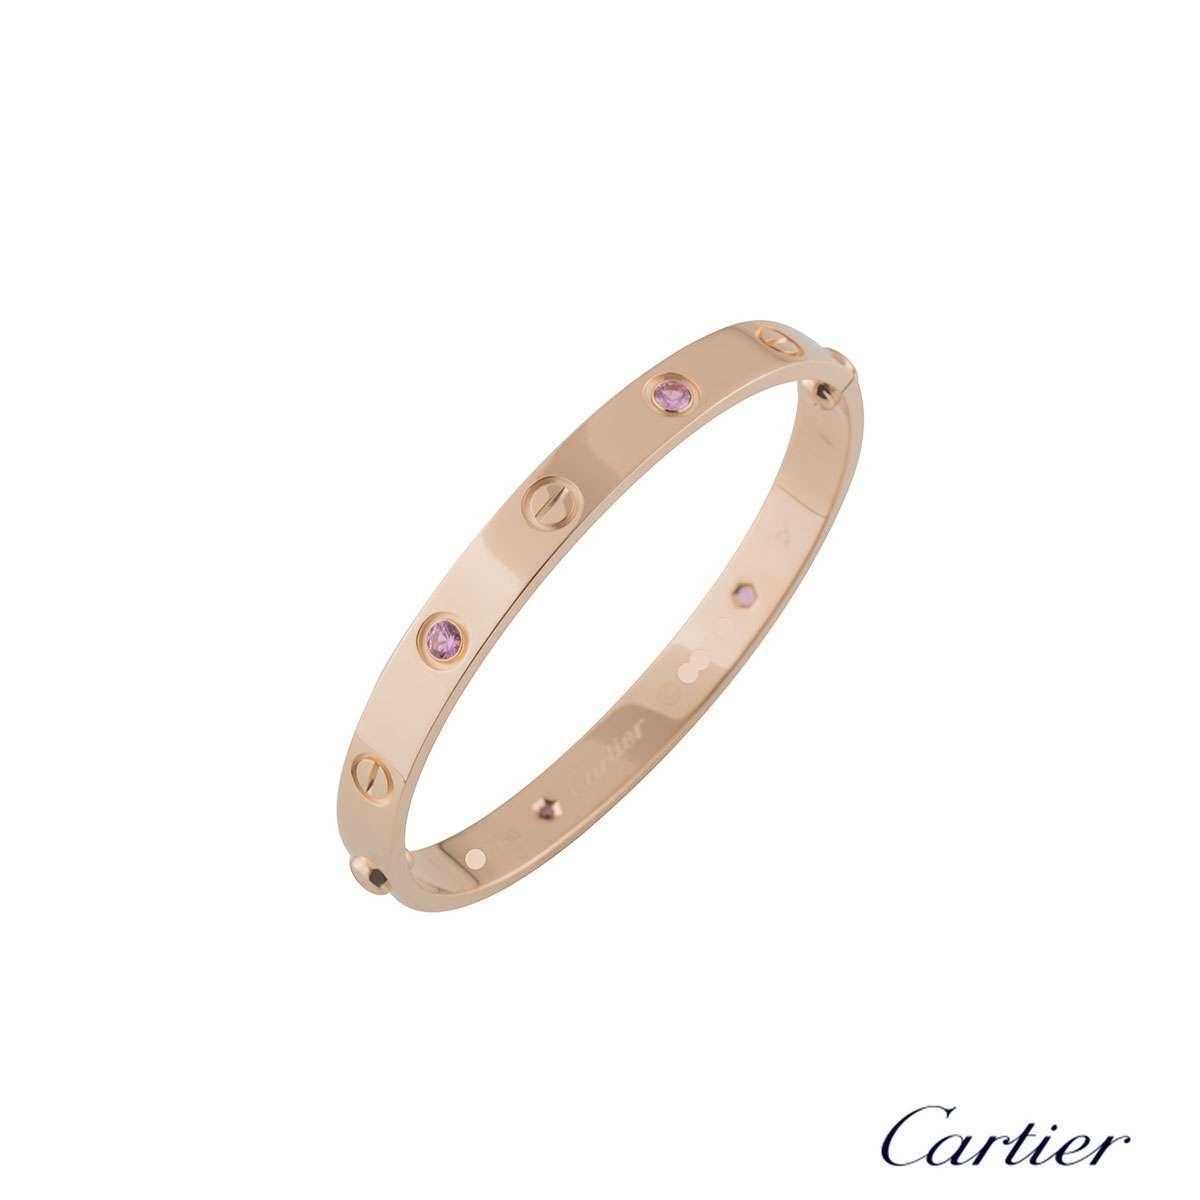 Cartier Rose Gold Pink Sapphire Love Bracelet Size 16 B60311116